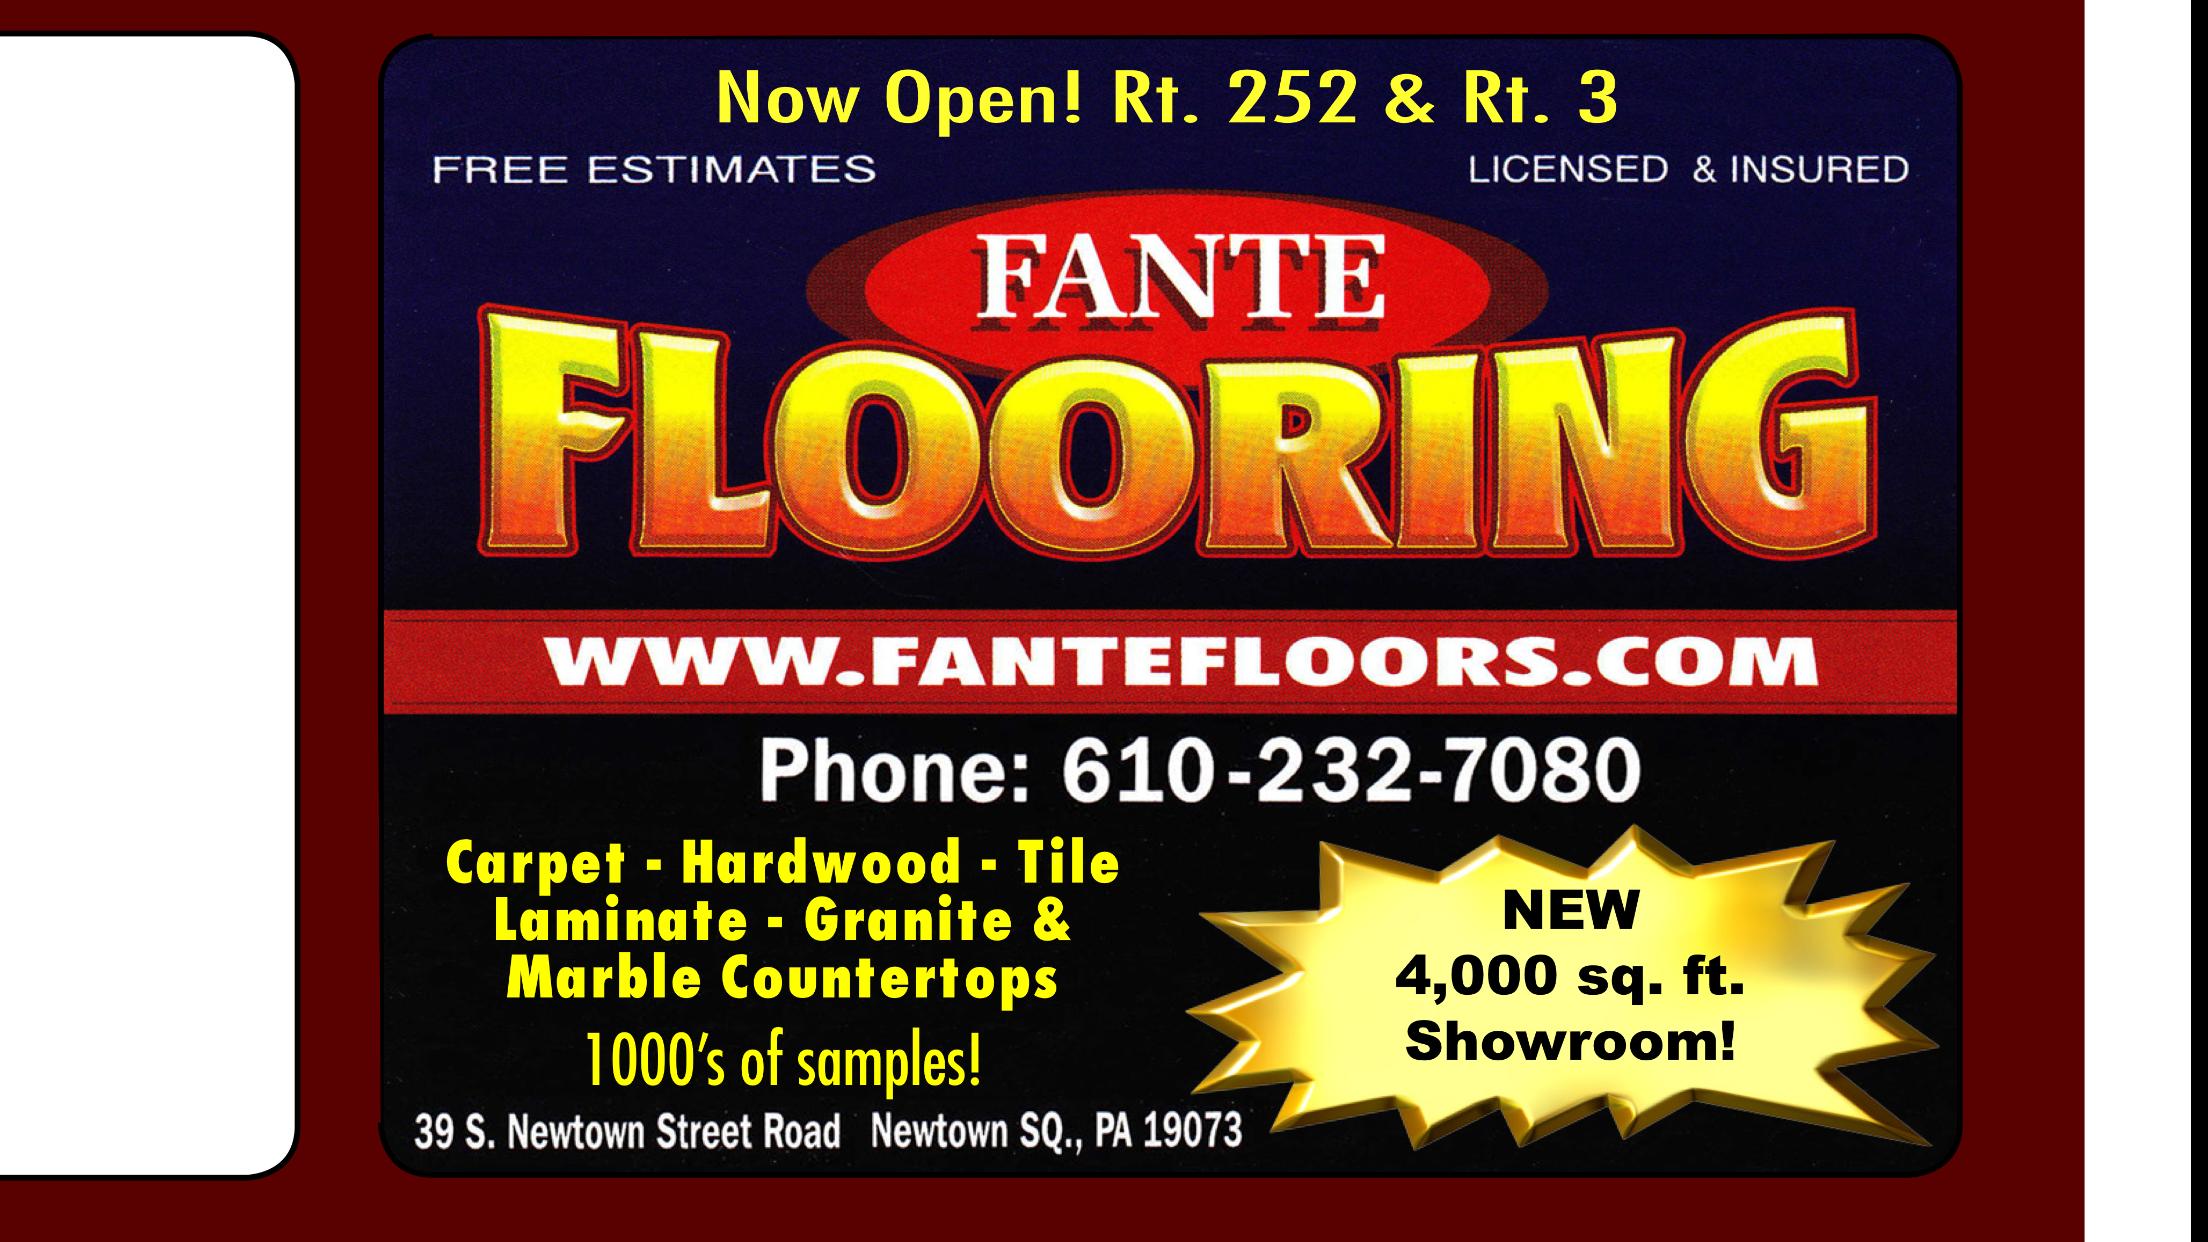 Fante Flooring & Window Treatments image 2